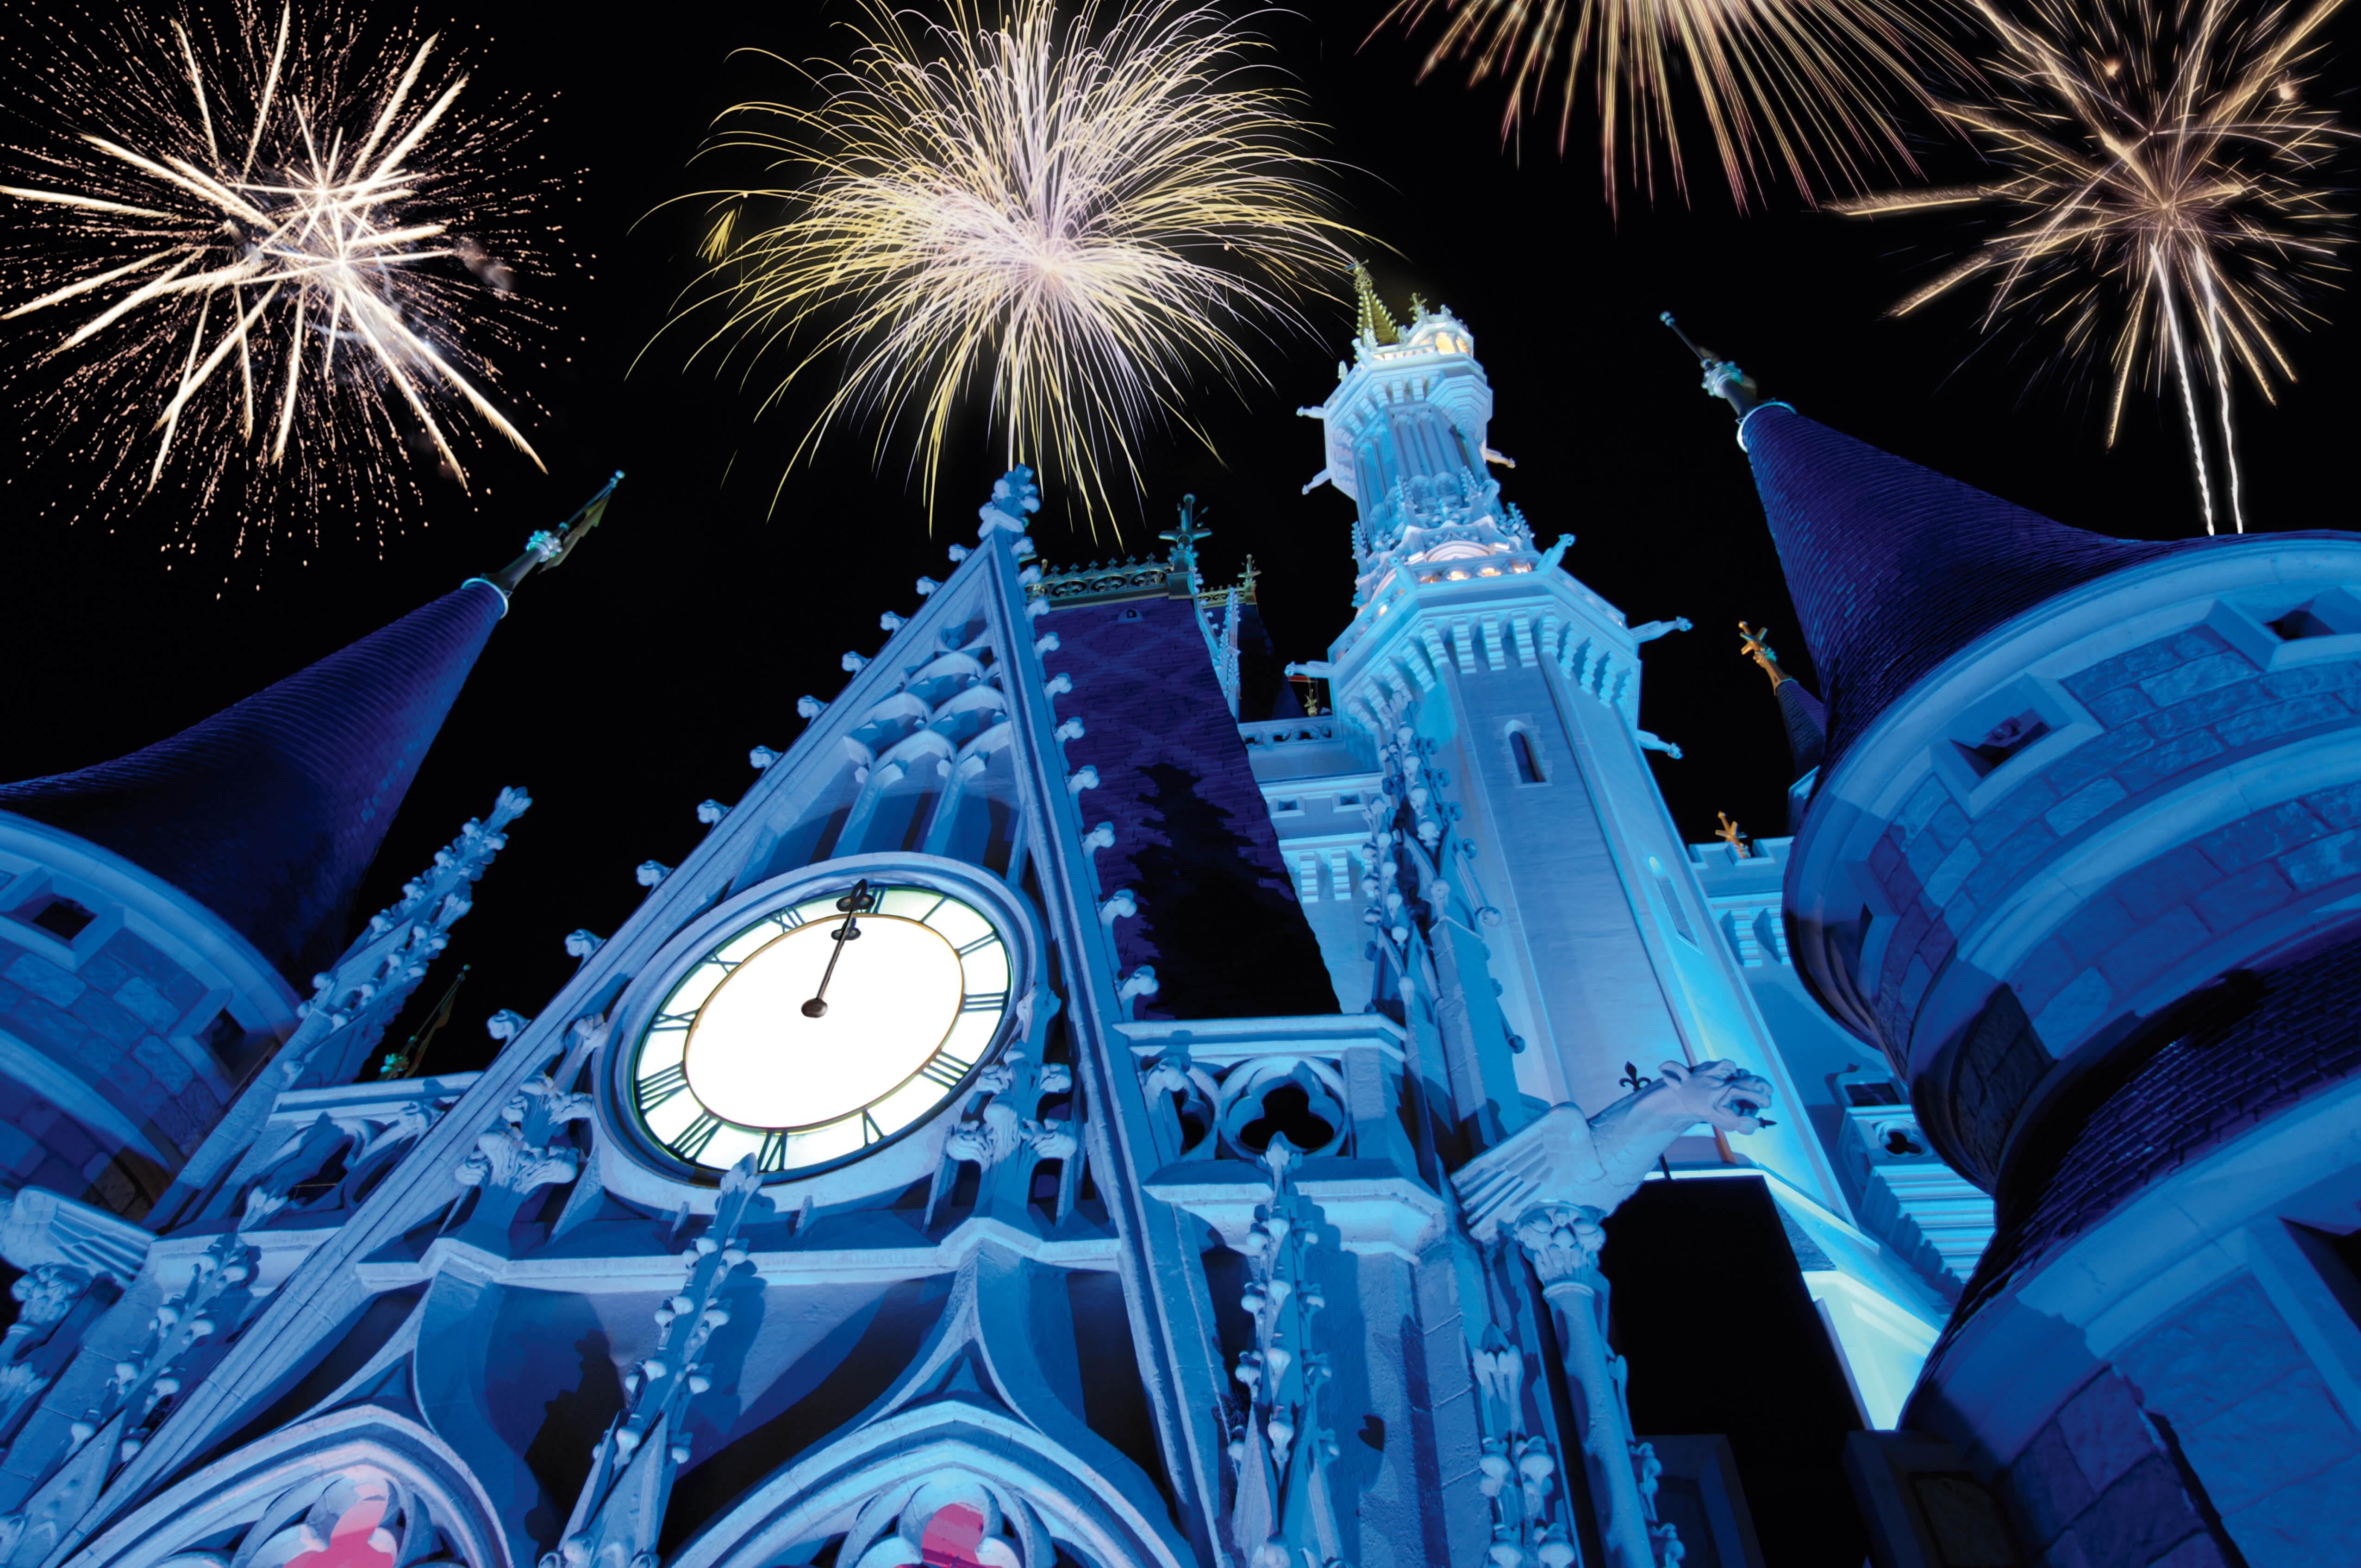 astoria park fireworks 2020